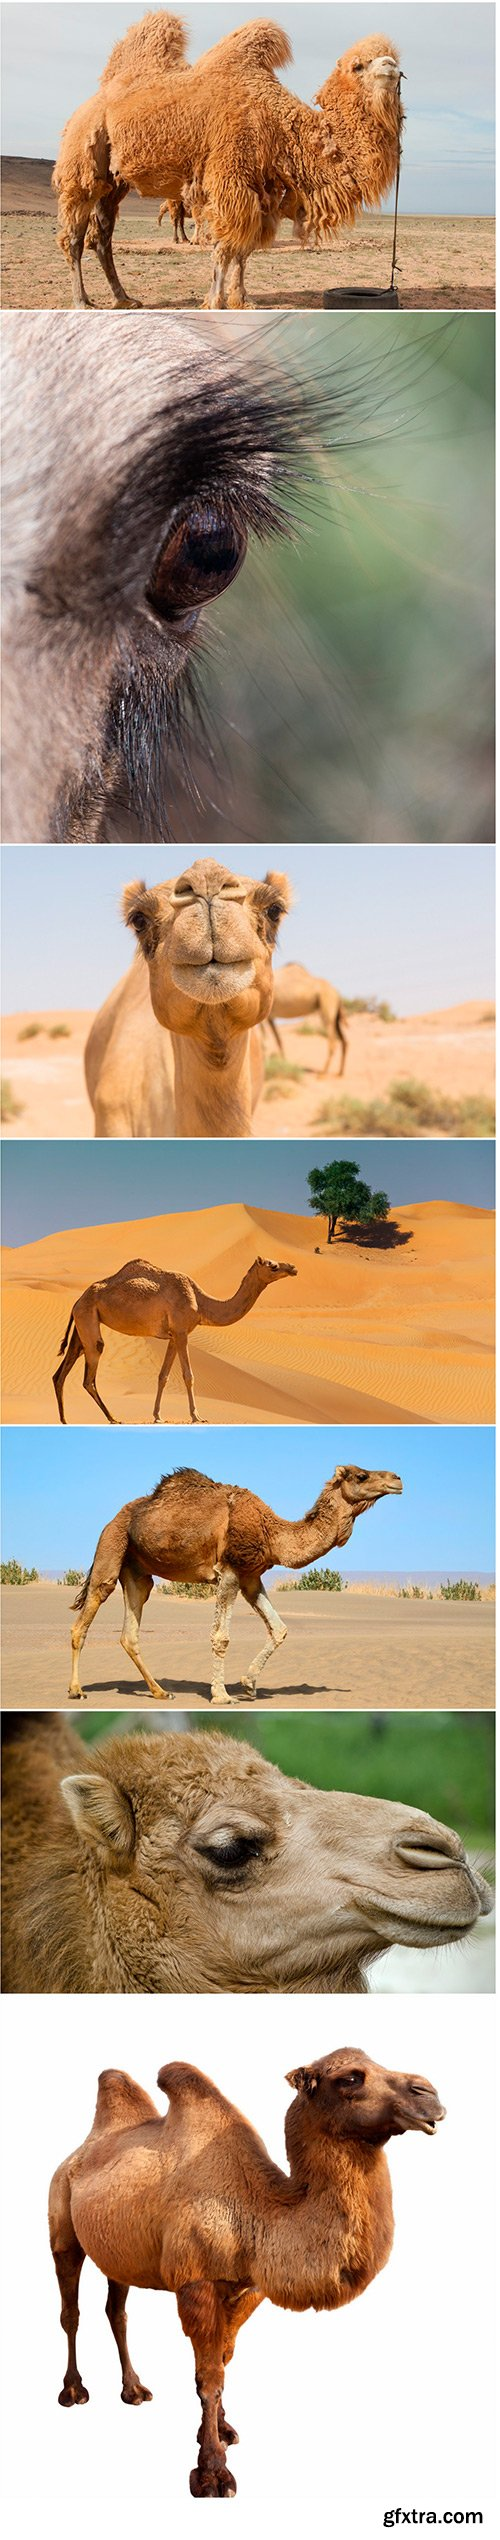 Camel - 7UHQ JPEG